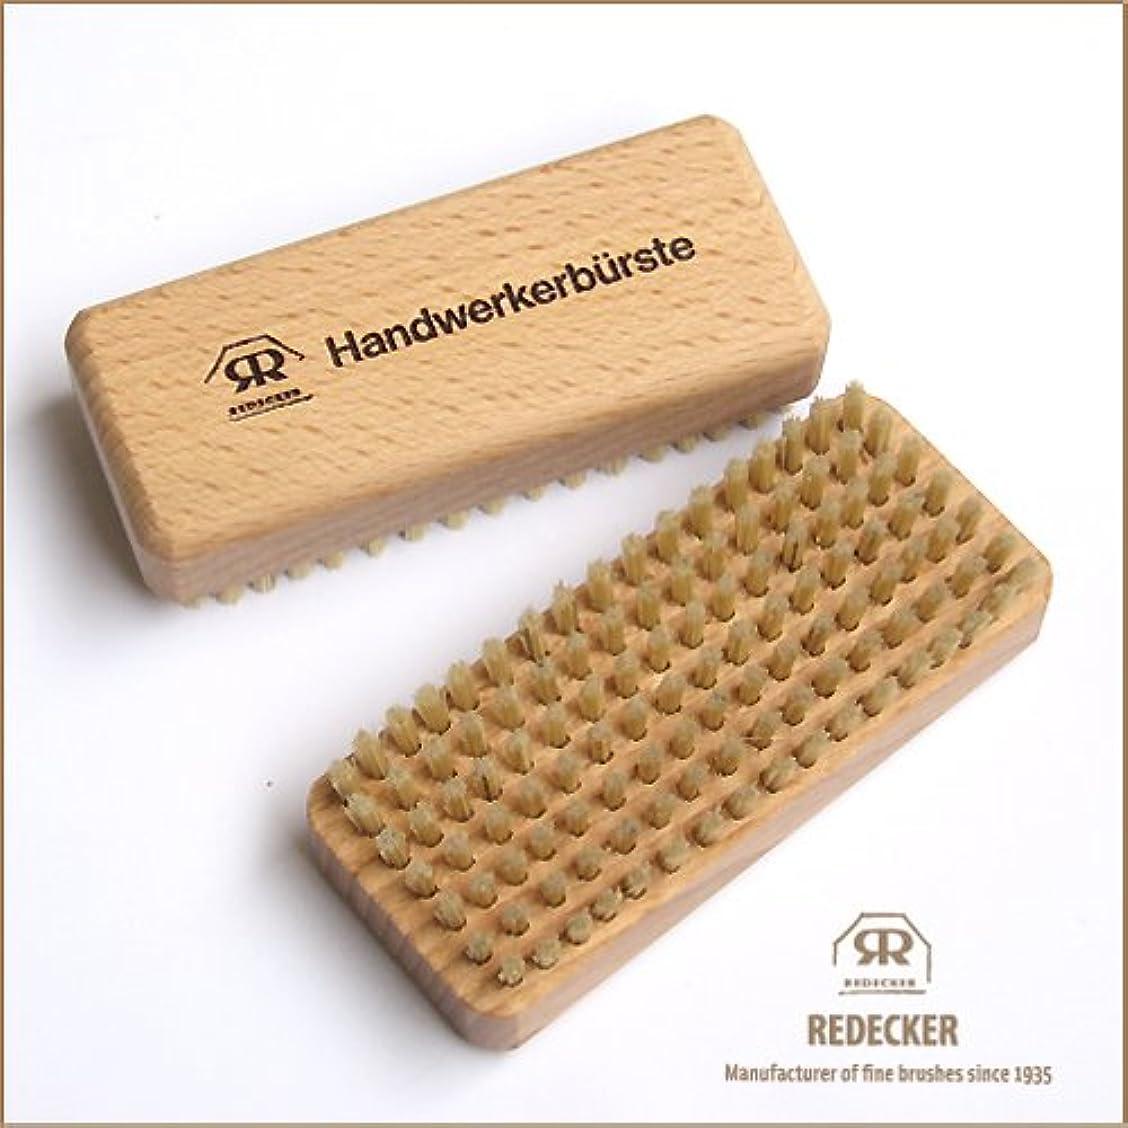 [REDECKER/レデッカー]クラフトマン手洗いブラシ(豚毛/ハードタイプ)